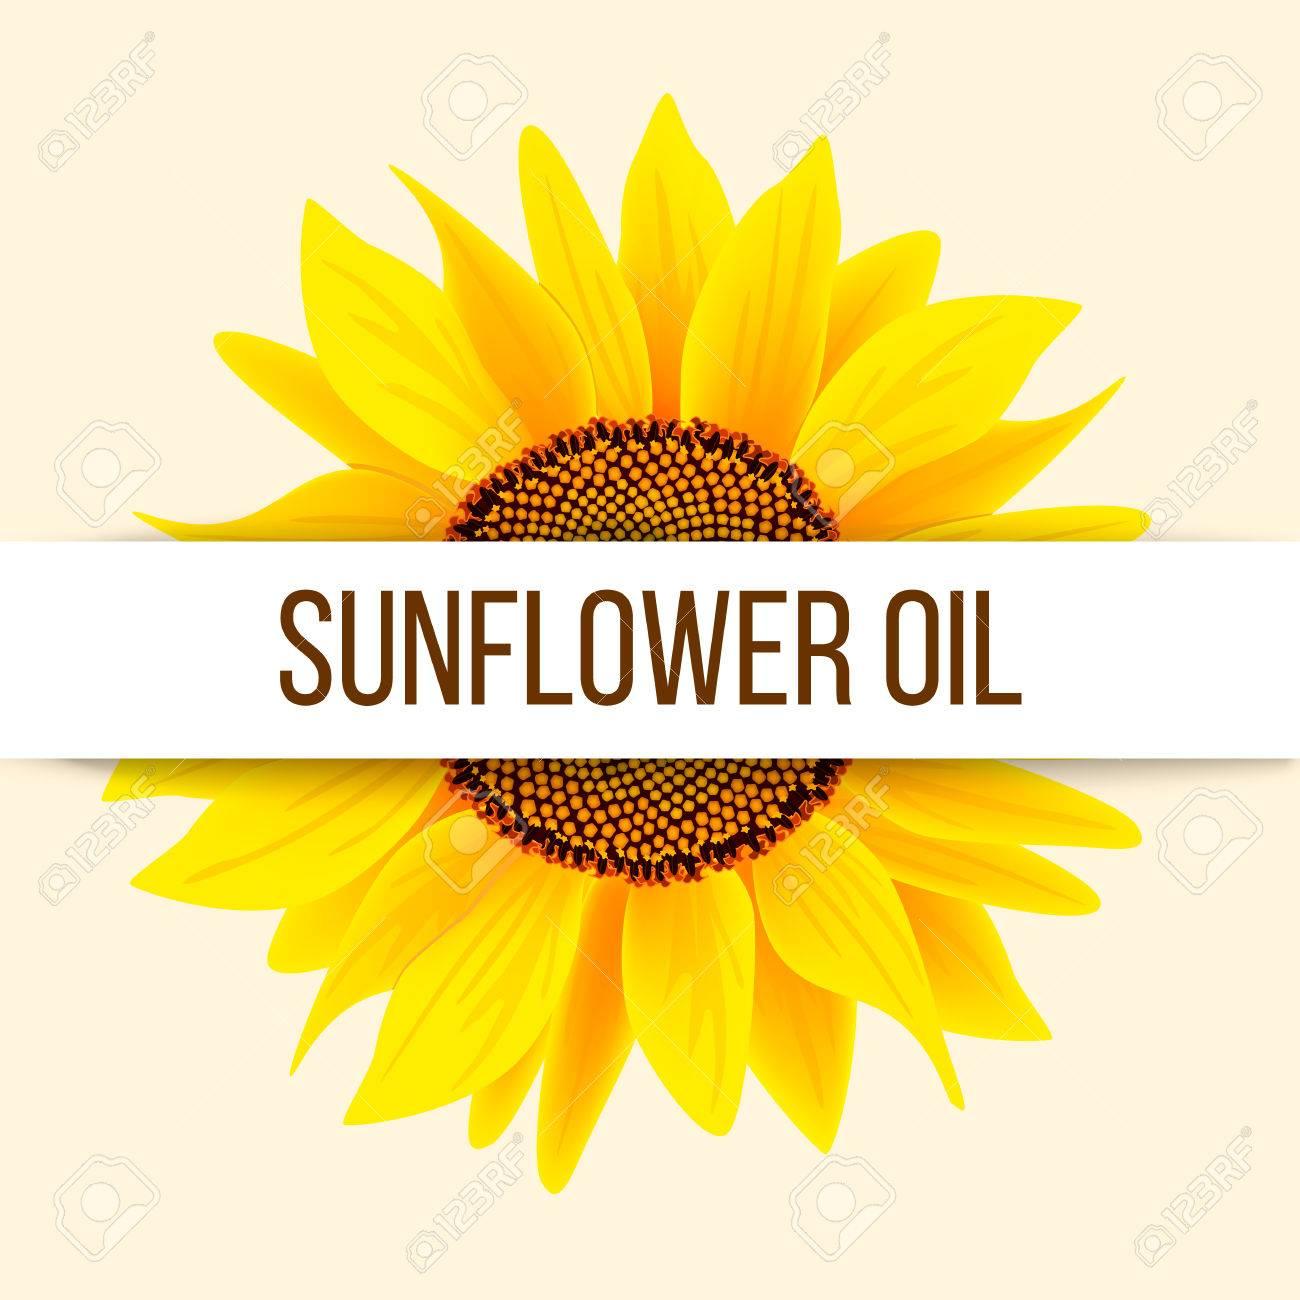 Sunflower Logo Stock Photos Royalty Free Sunflower Logo Images